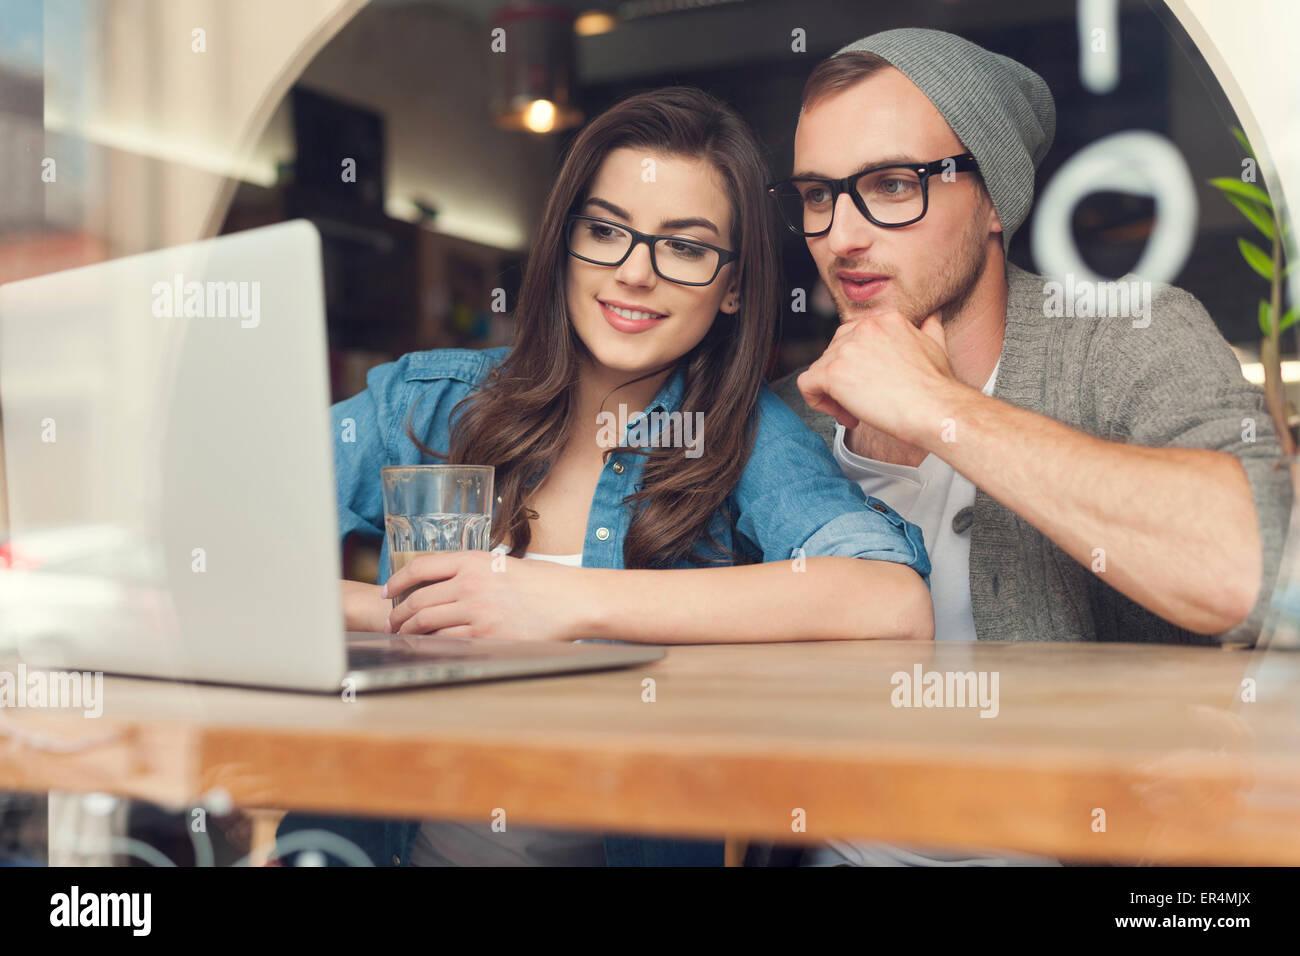 Paar genießt das drahtlose Internet im Café. Krakau, Polen Stockbild